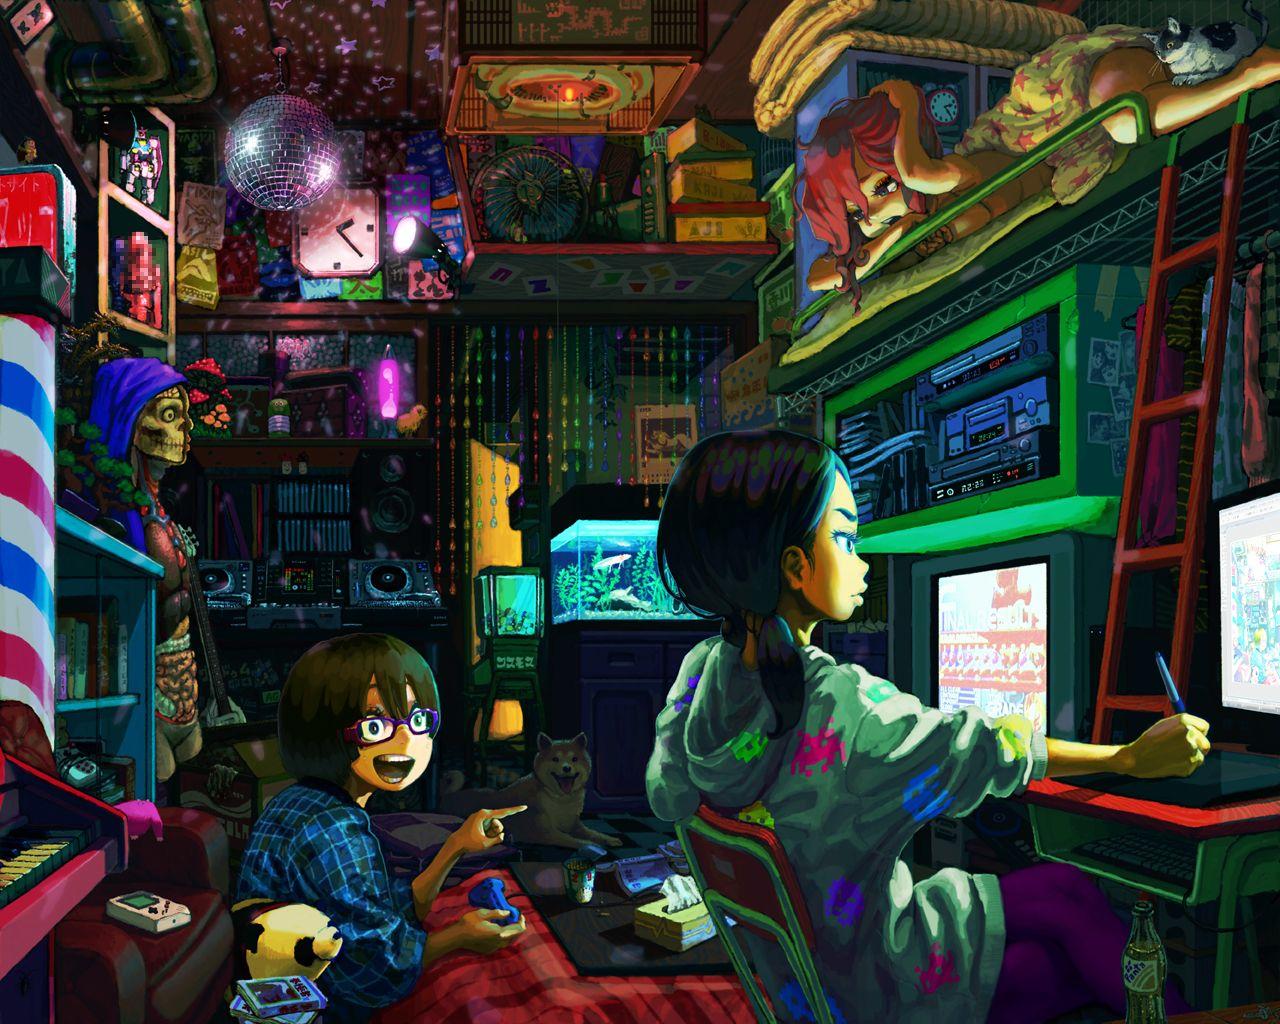 Otaku Room Otaku Room Colorful Art Anime Style